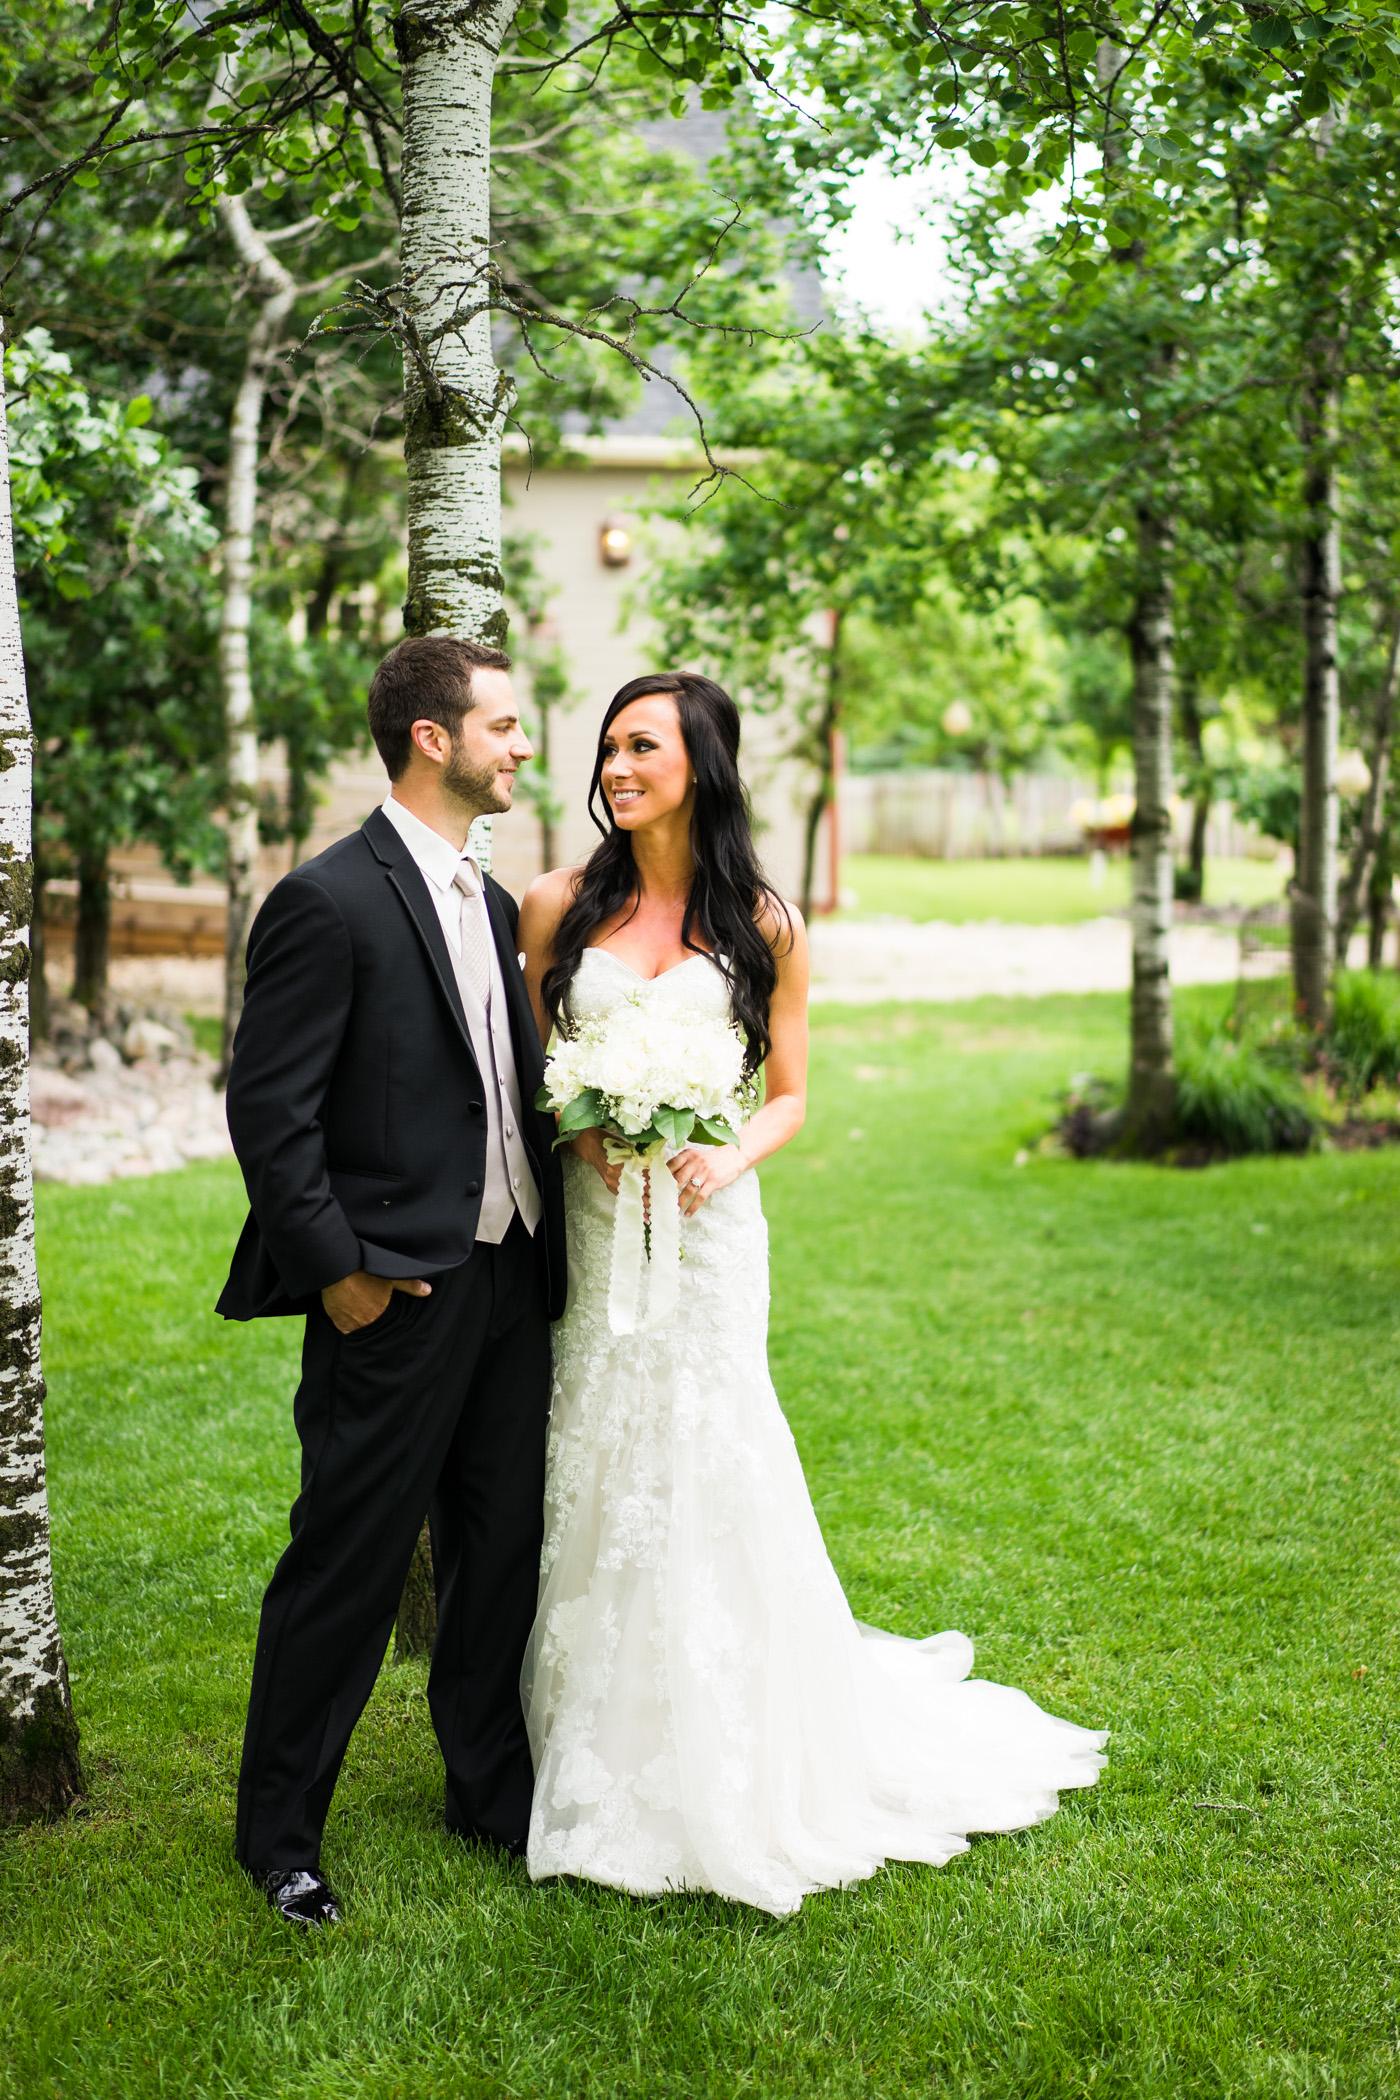 Hillary and Mark - Pineridge Hollow Wedding - Cojo Photo-344.jpg